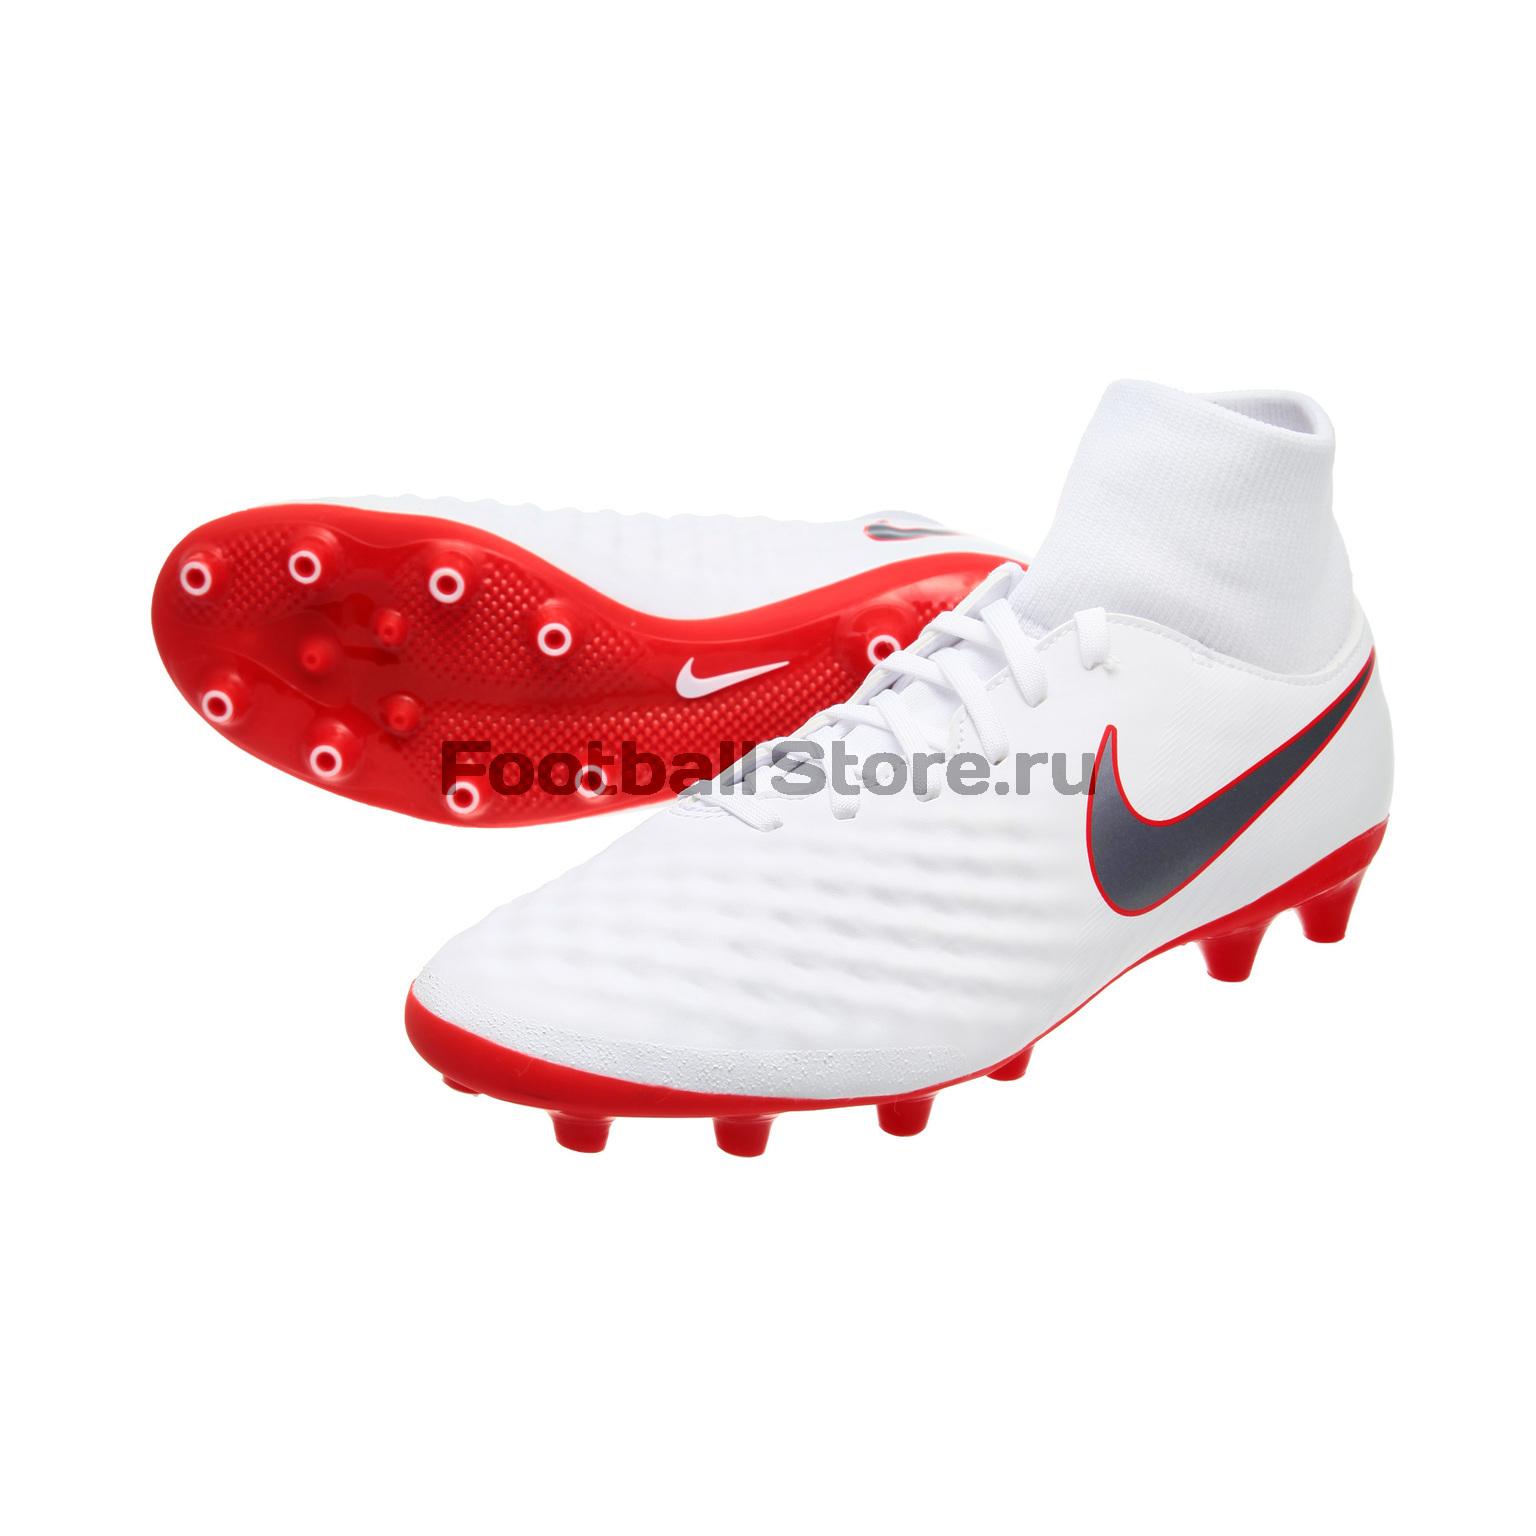 Бутсы Nike Obra 2 Academy DF AG-Pro AO4810-107 бутсы nike phantom 3 academy df ag pro ah7266 107